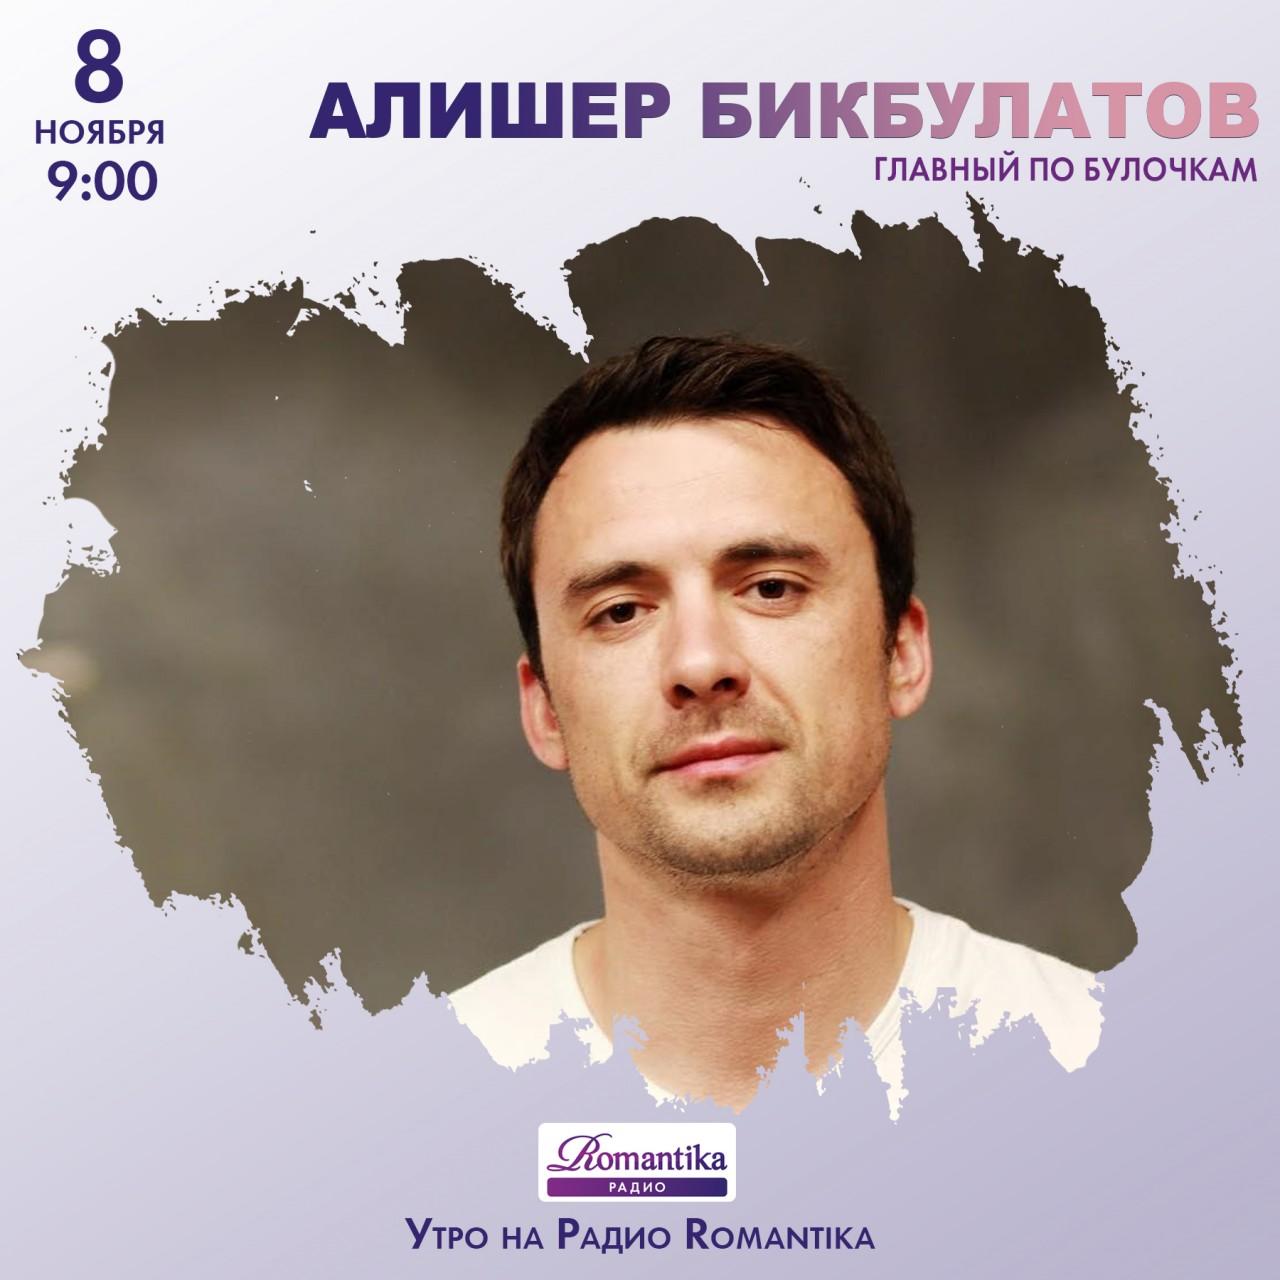 Радио Romantika: 8 ноября - …